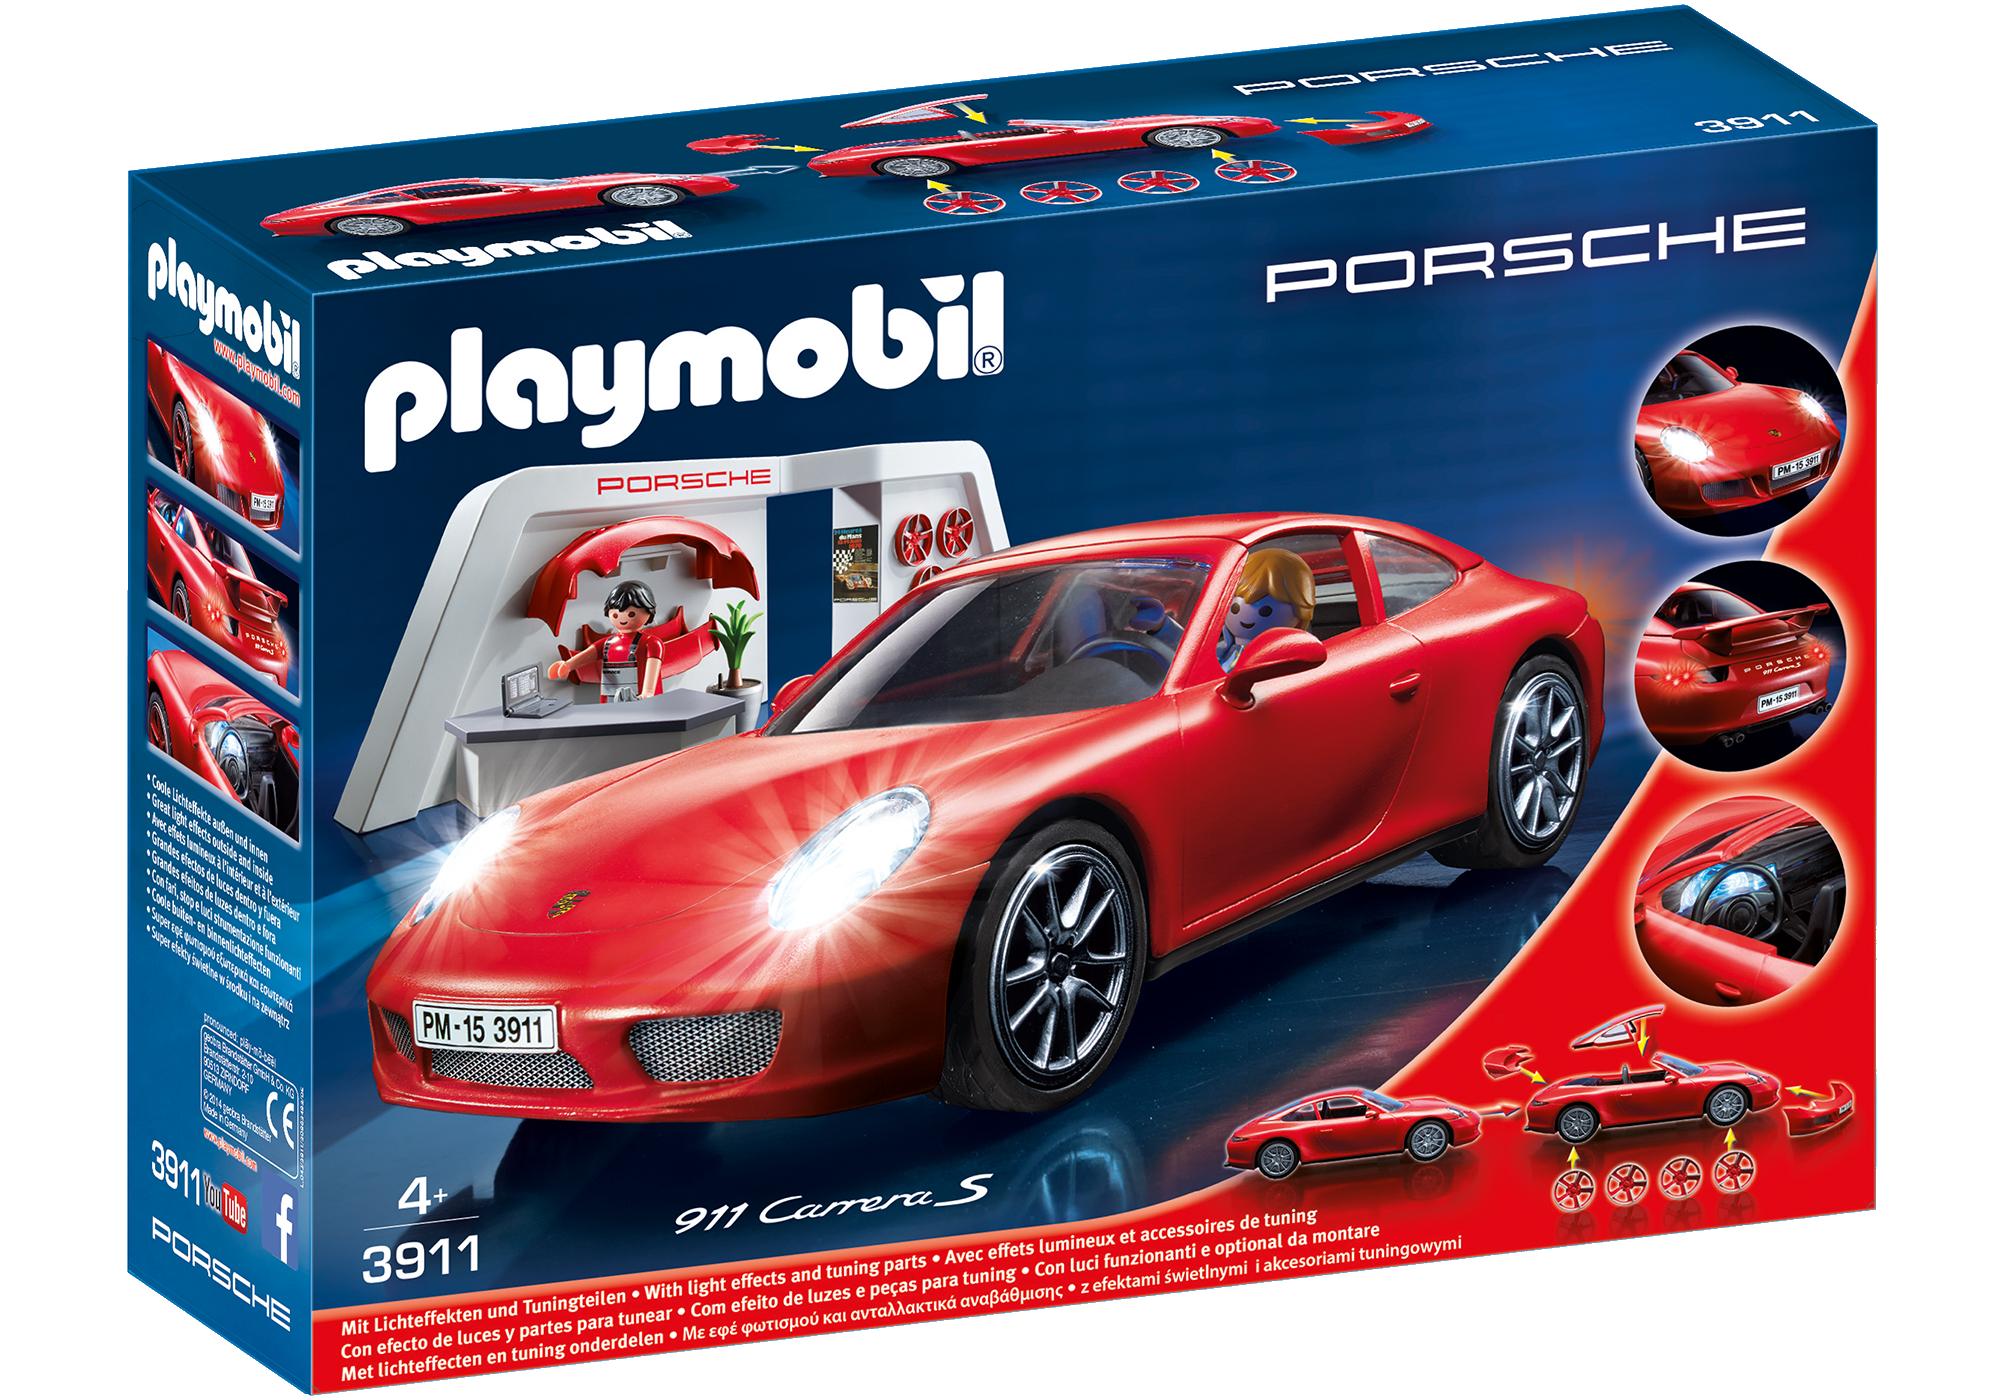 http://media.playmobil.com/i/playmobil/3911_product_box_front/Porsche 911 Carrera S